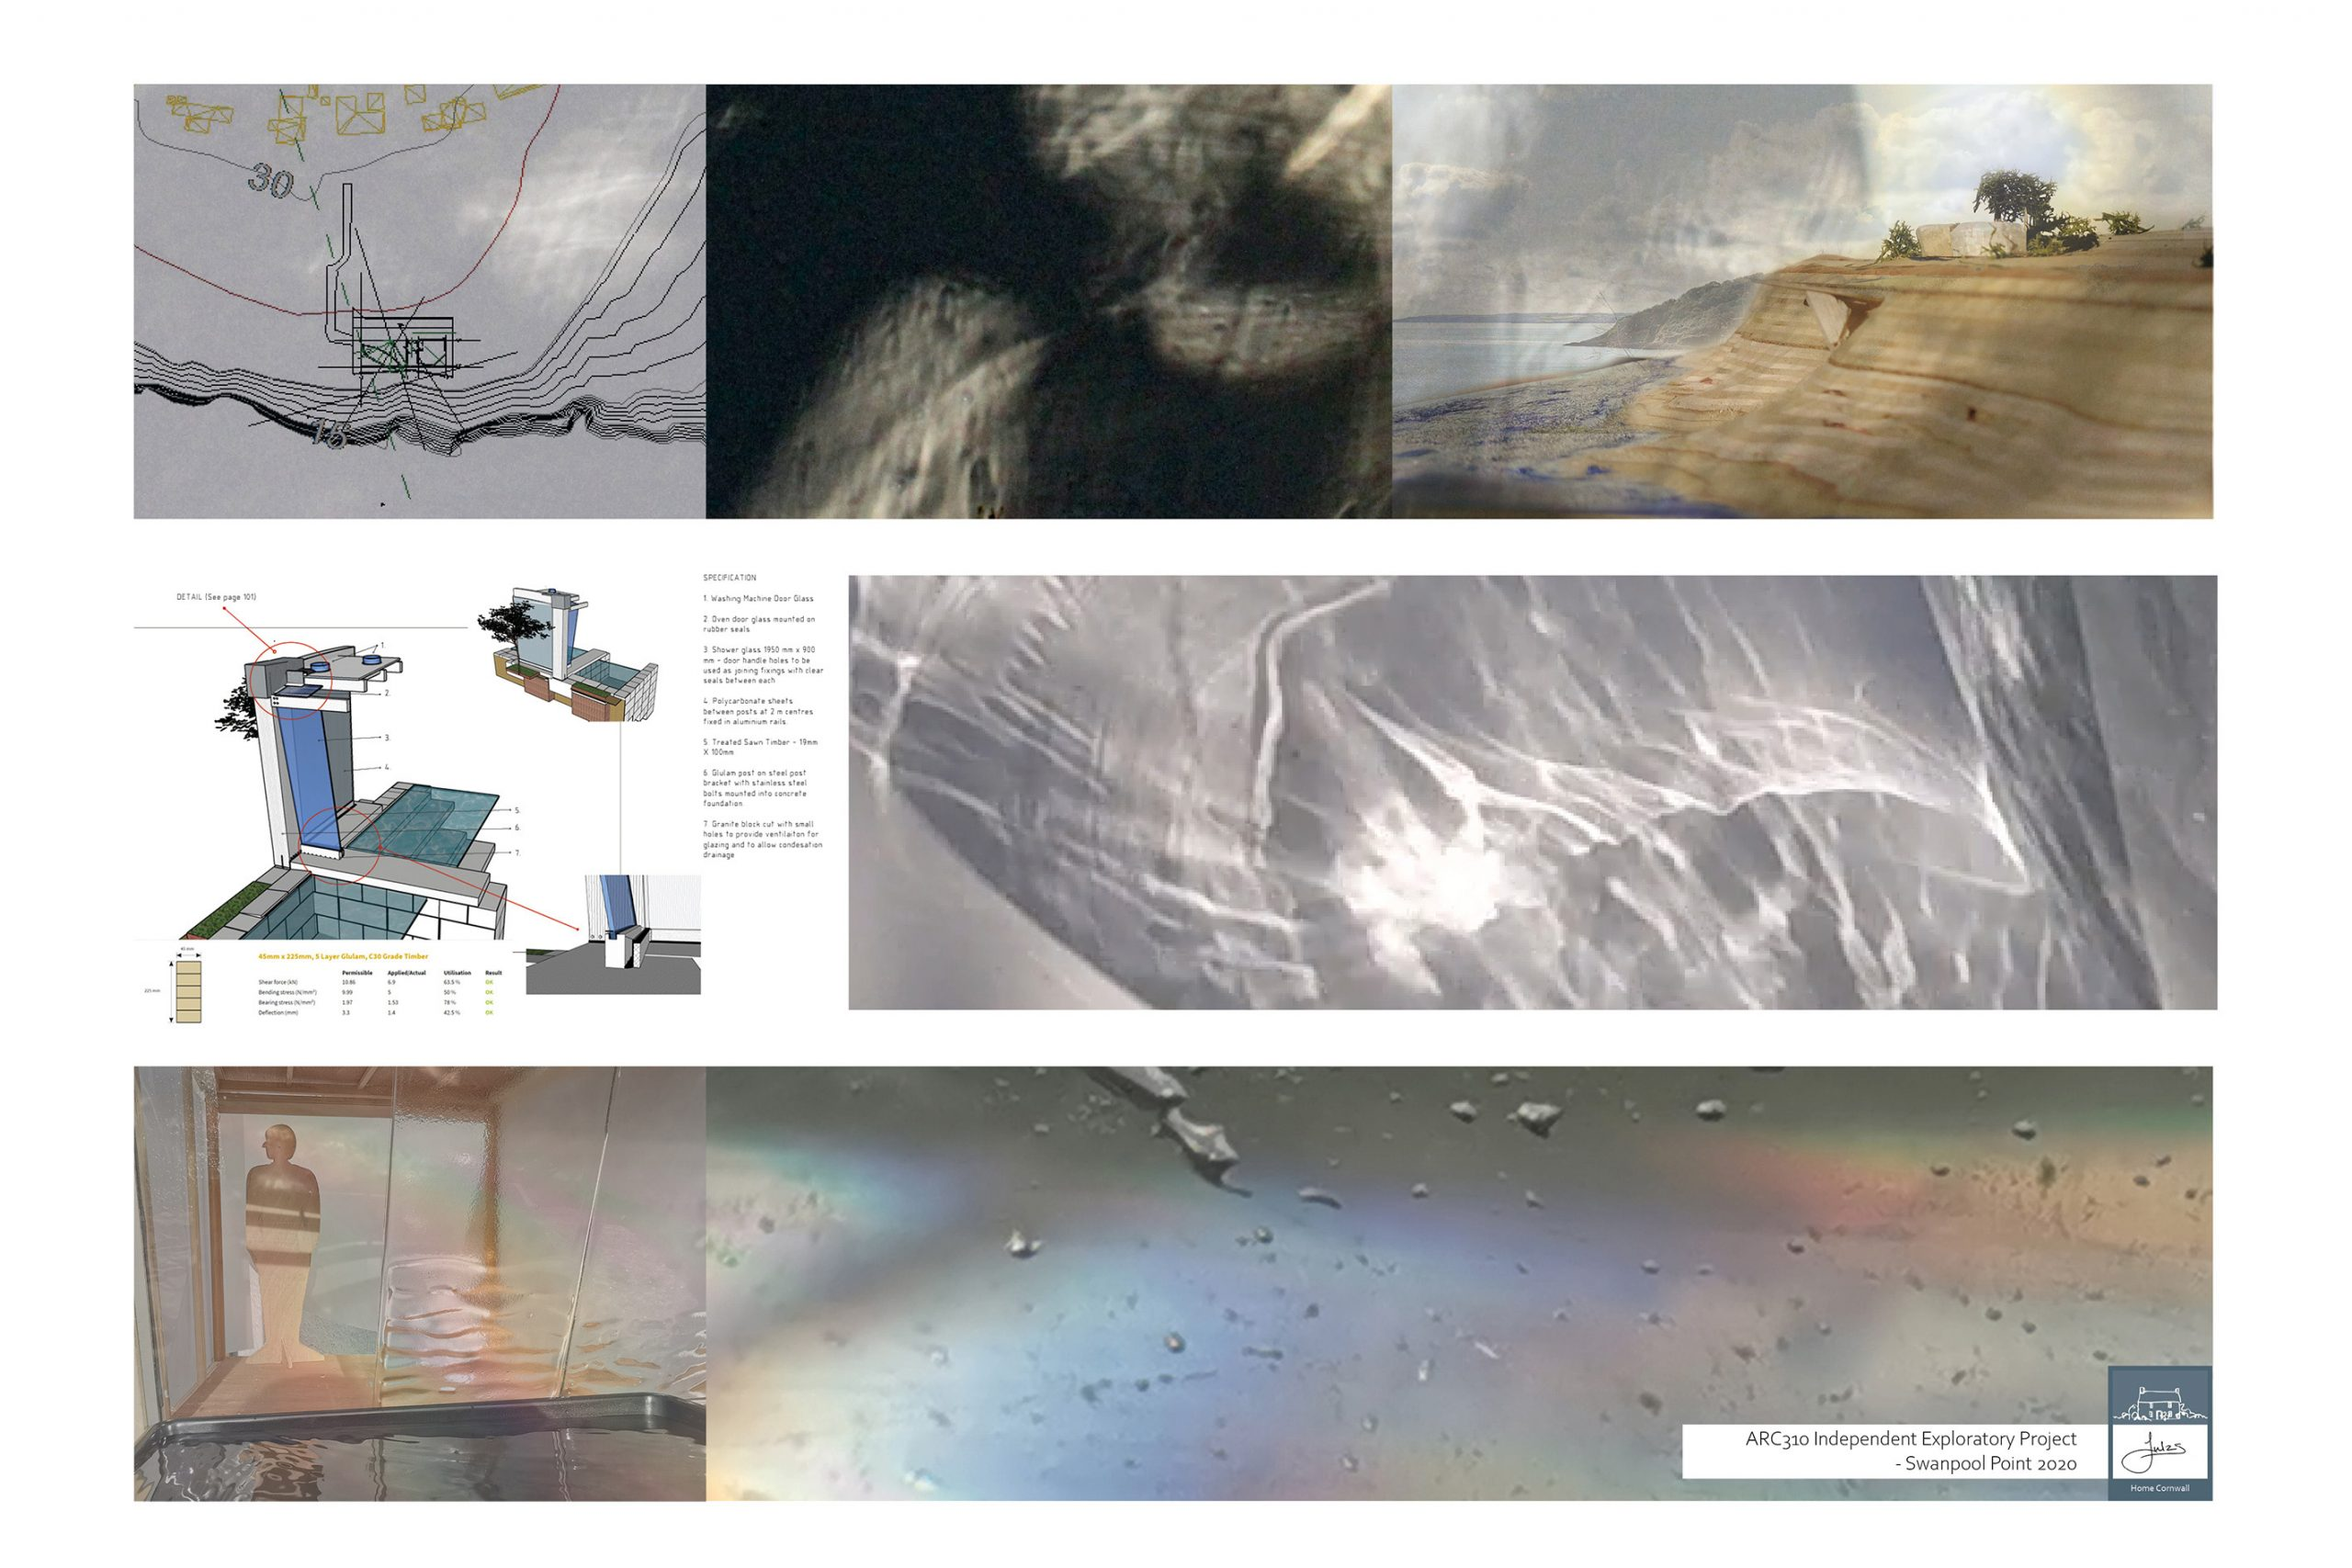 2 JULZS Preece ARC310 IndependentStudy ARCHITECTURE